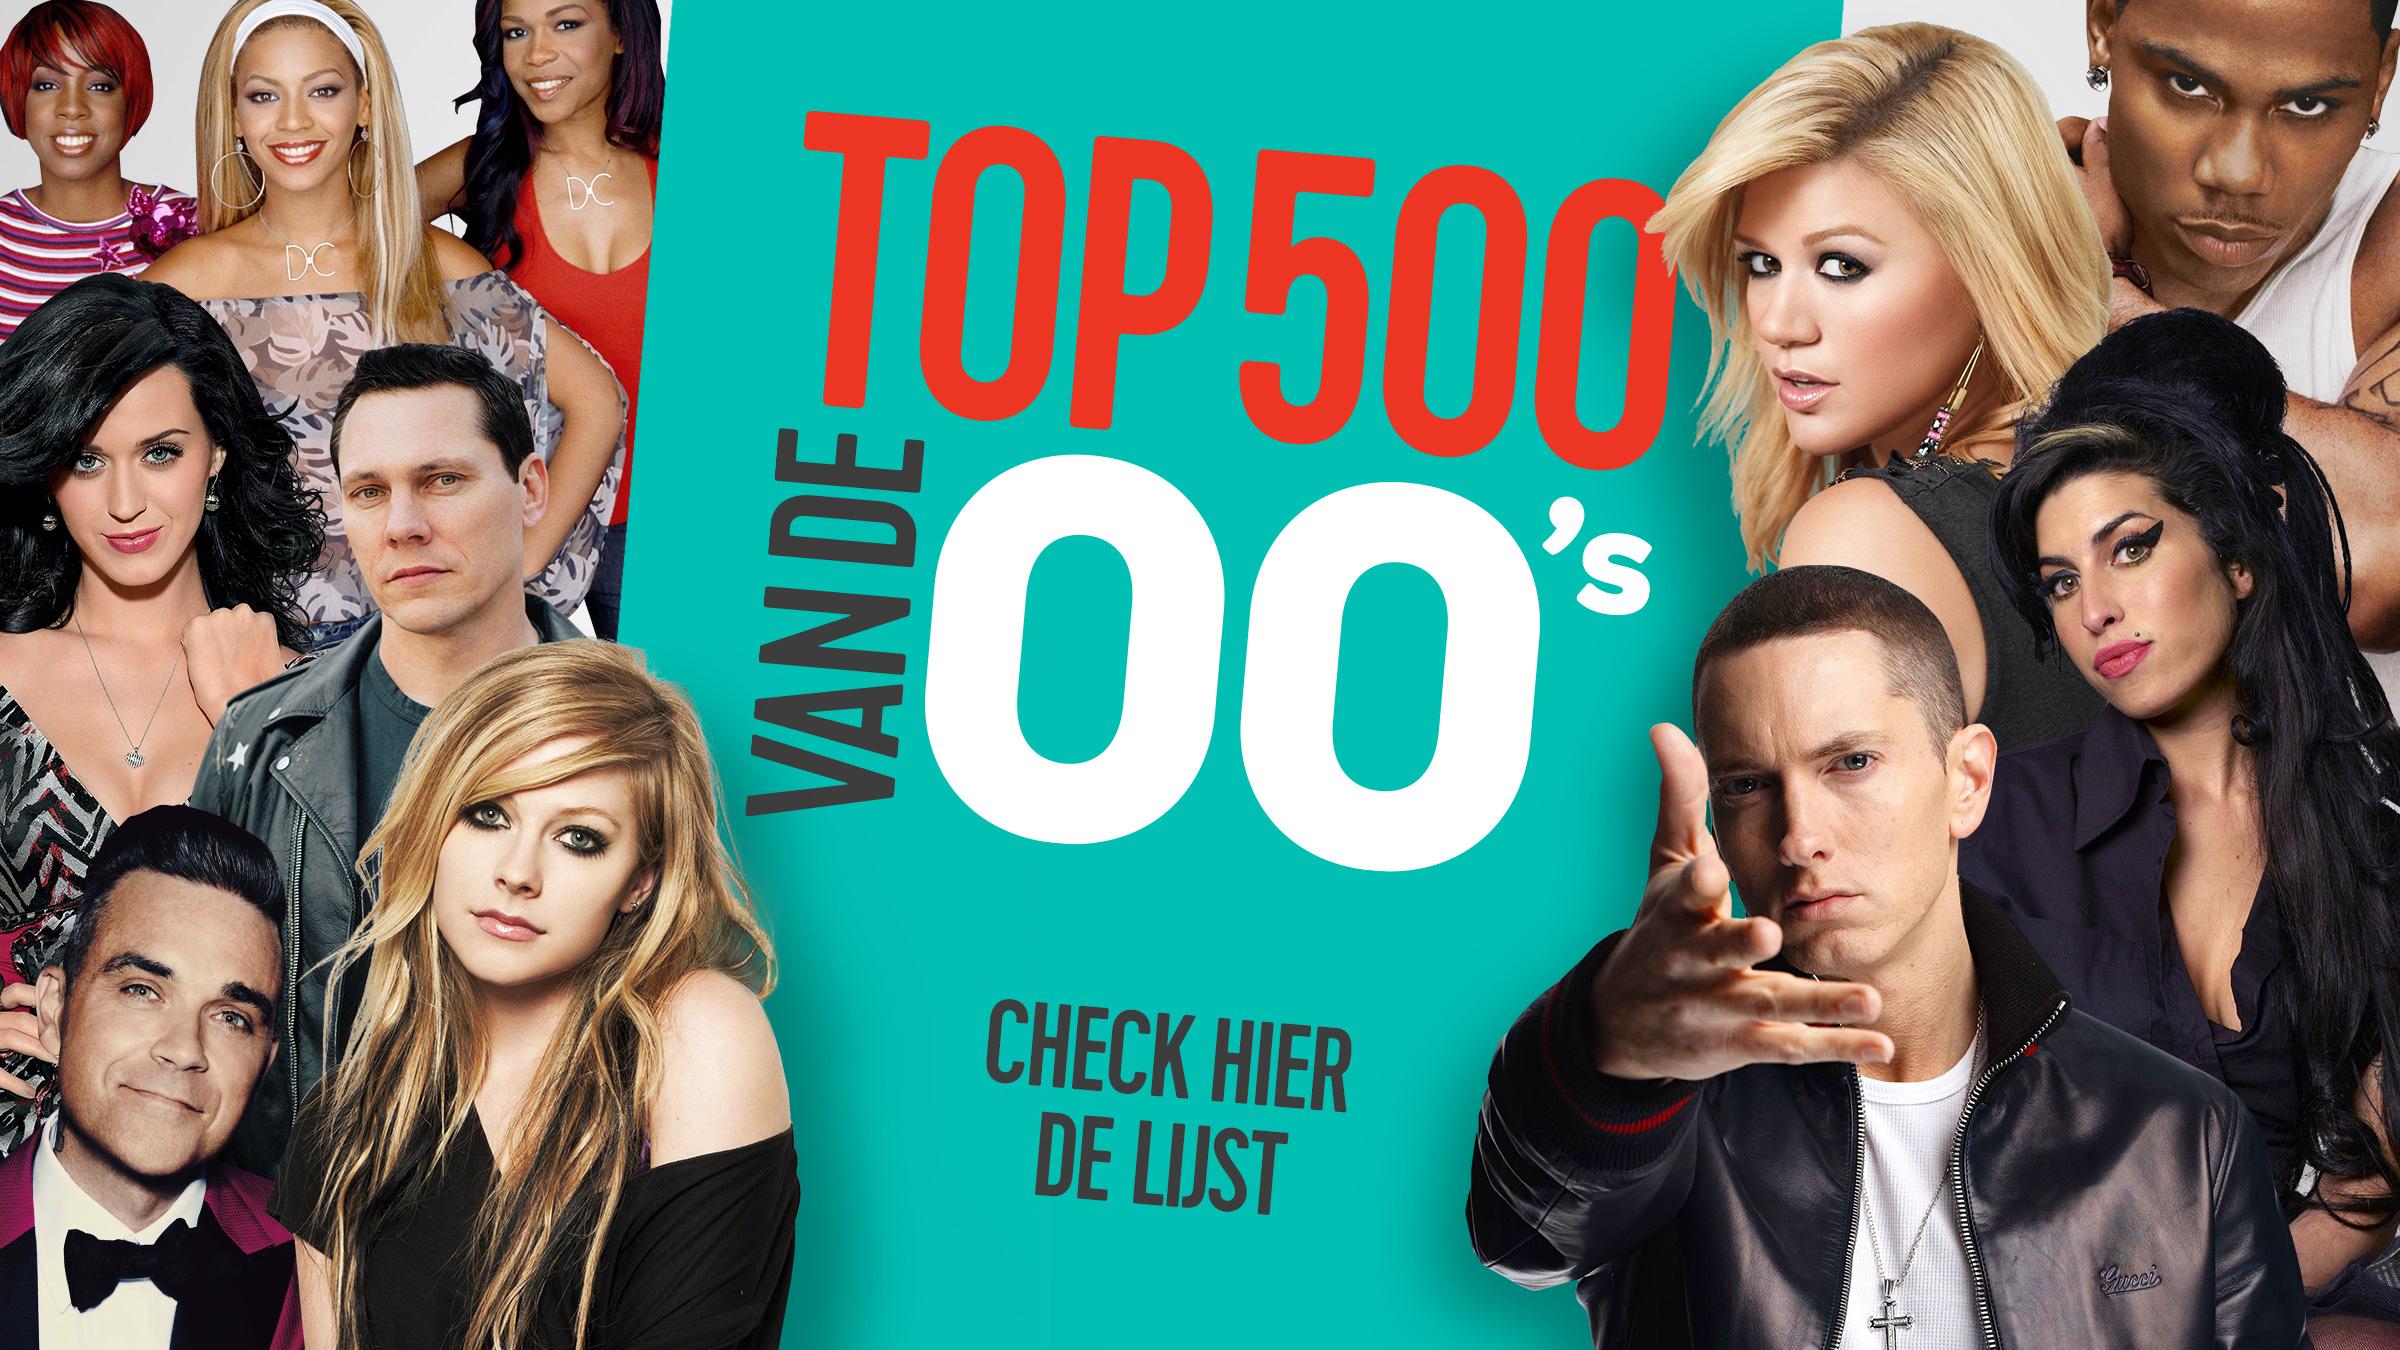 Qmusic teaser top500 00s check